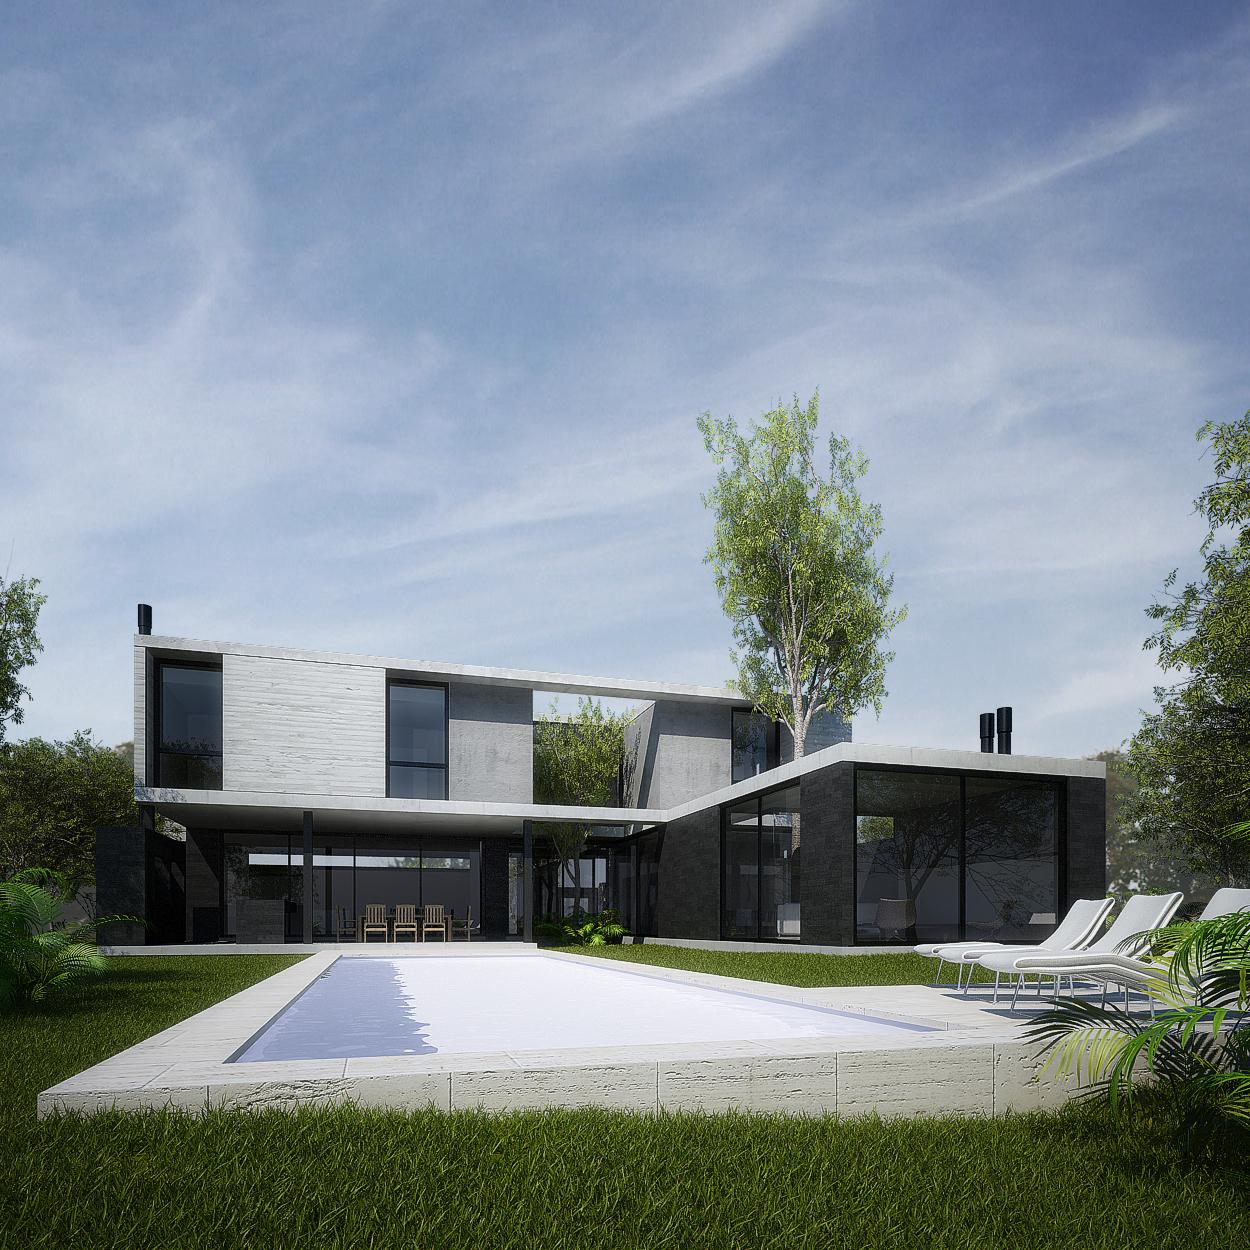 Casa e186 amado cattaneo arquitectos - Arquitectos casas modernas ...